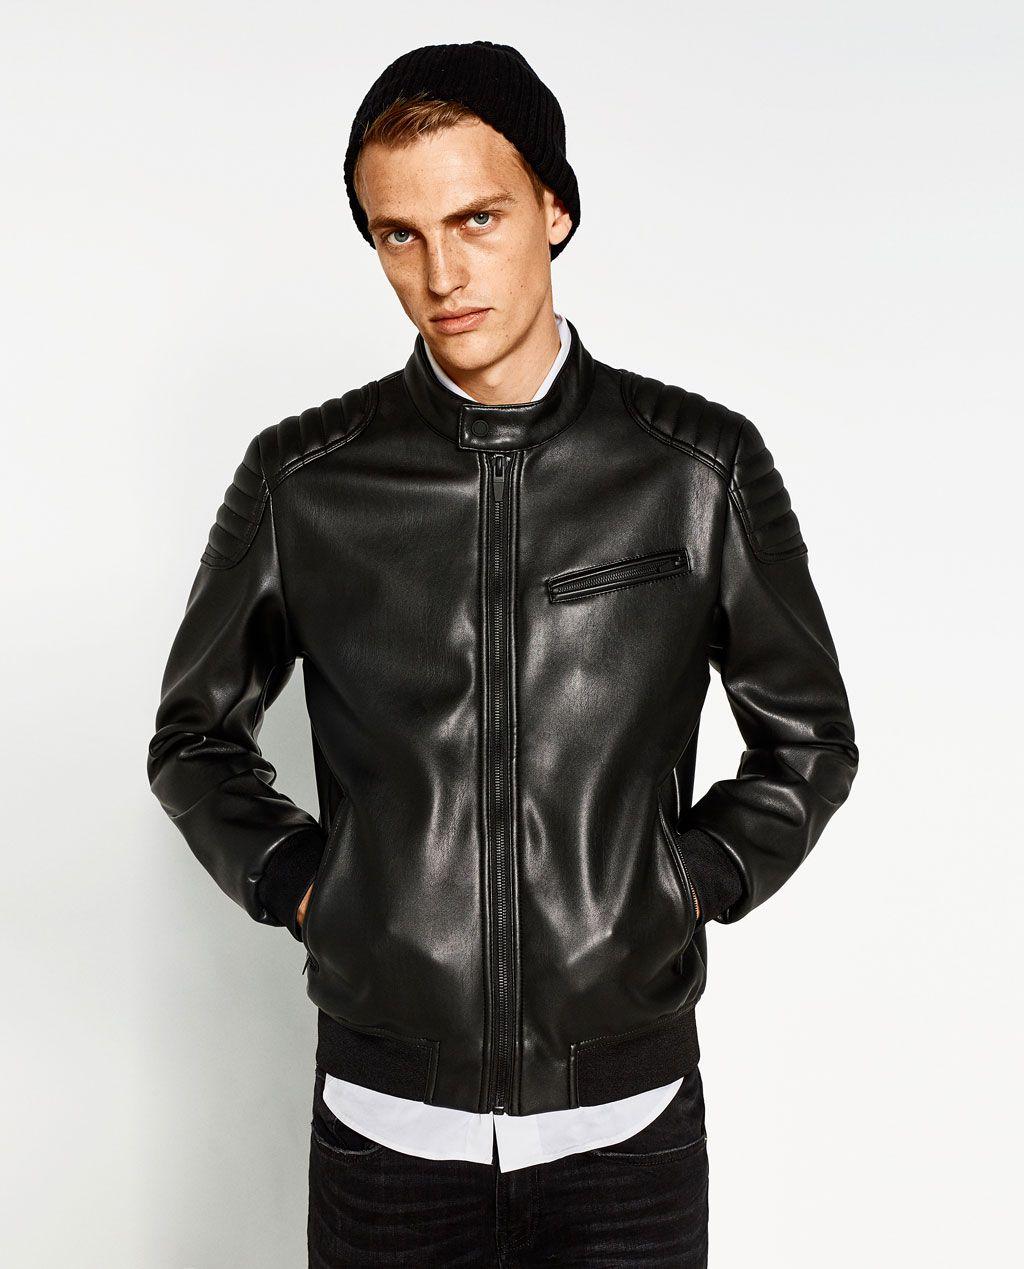 2018 style Imagen CAZADORA jackets Zara en de de 3 BIKER q0qpUzw